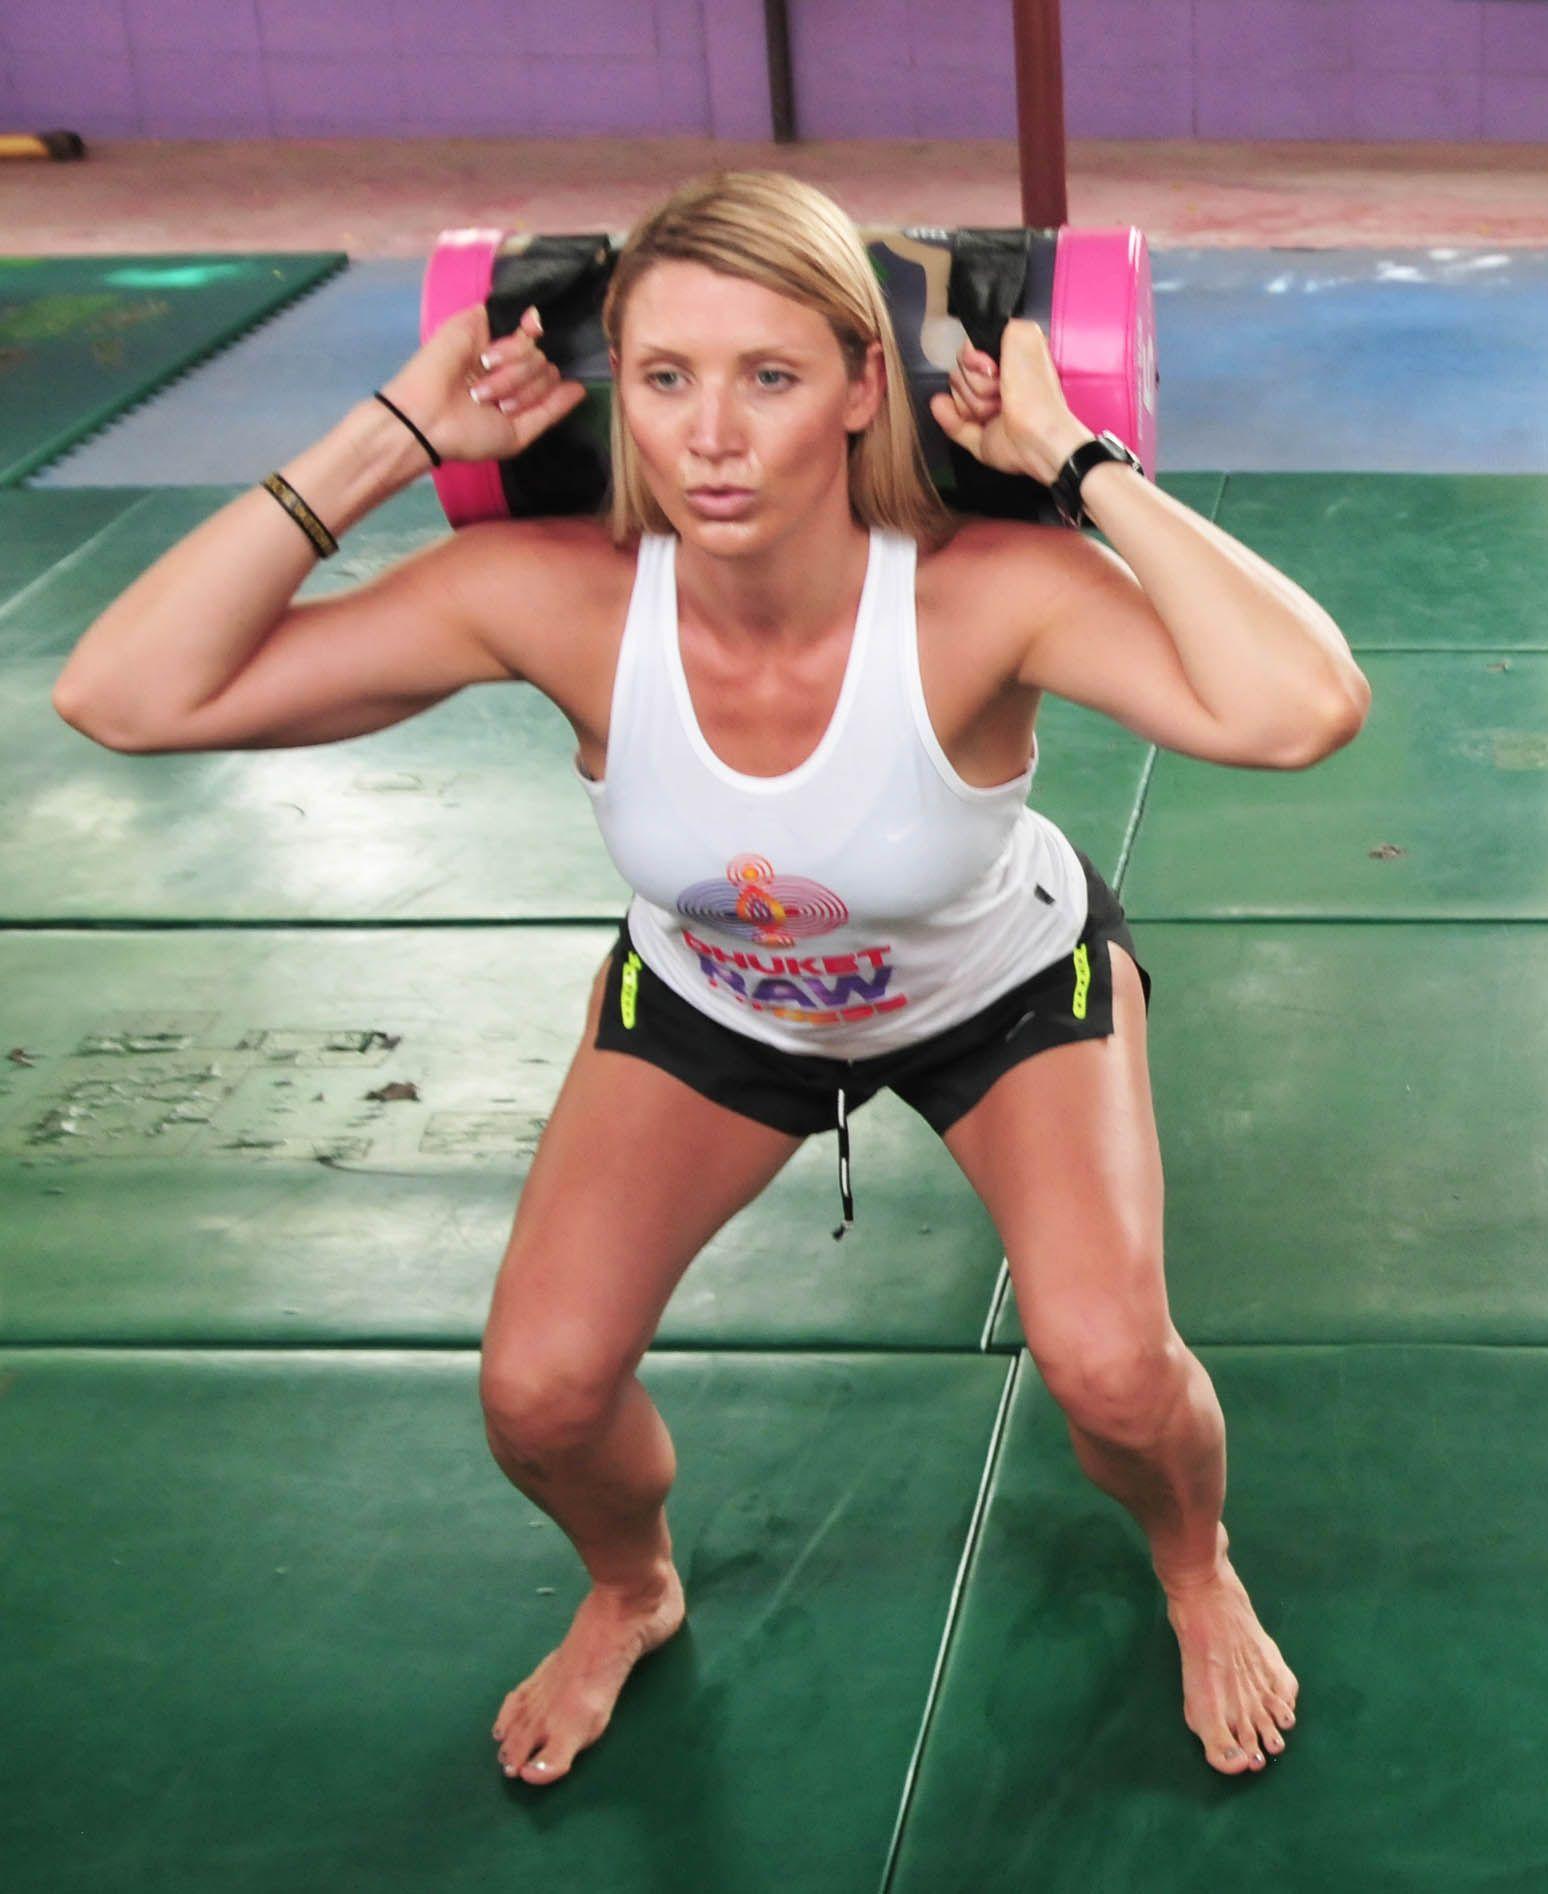 All Inclusive Wellness Retreat Holistic Fitness Natural Body Detox Yoga Nutrition